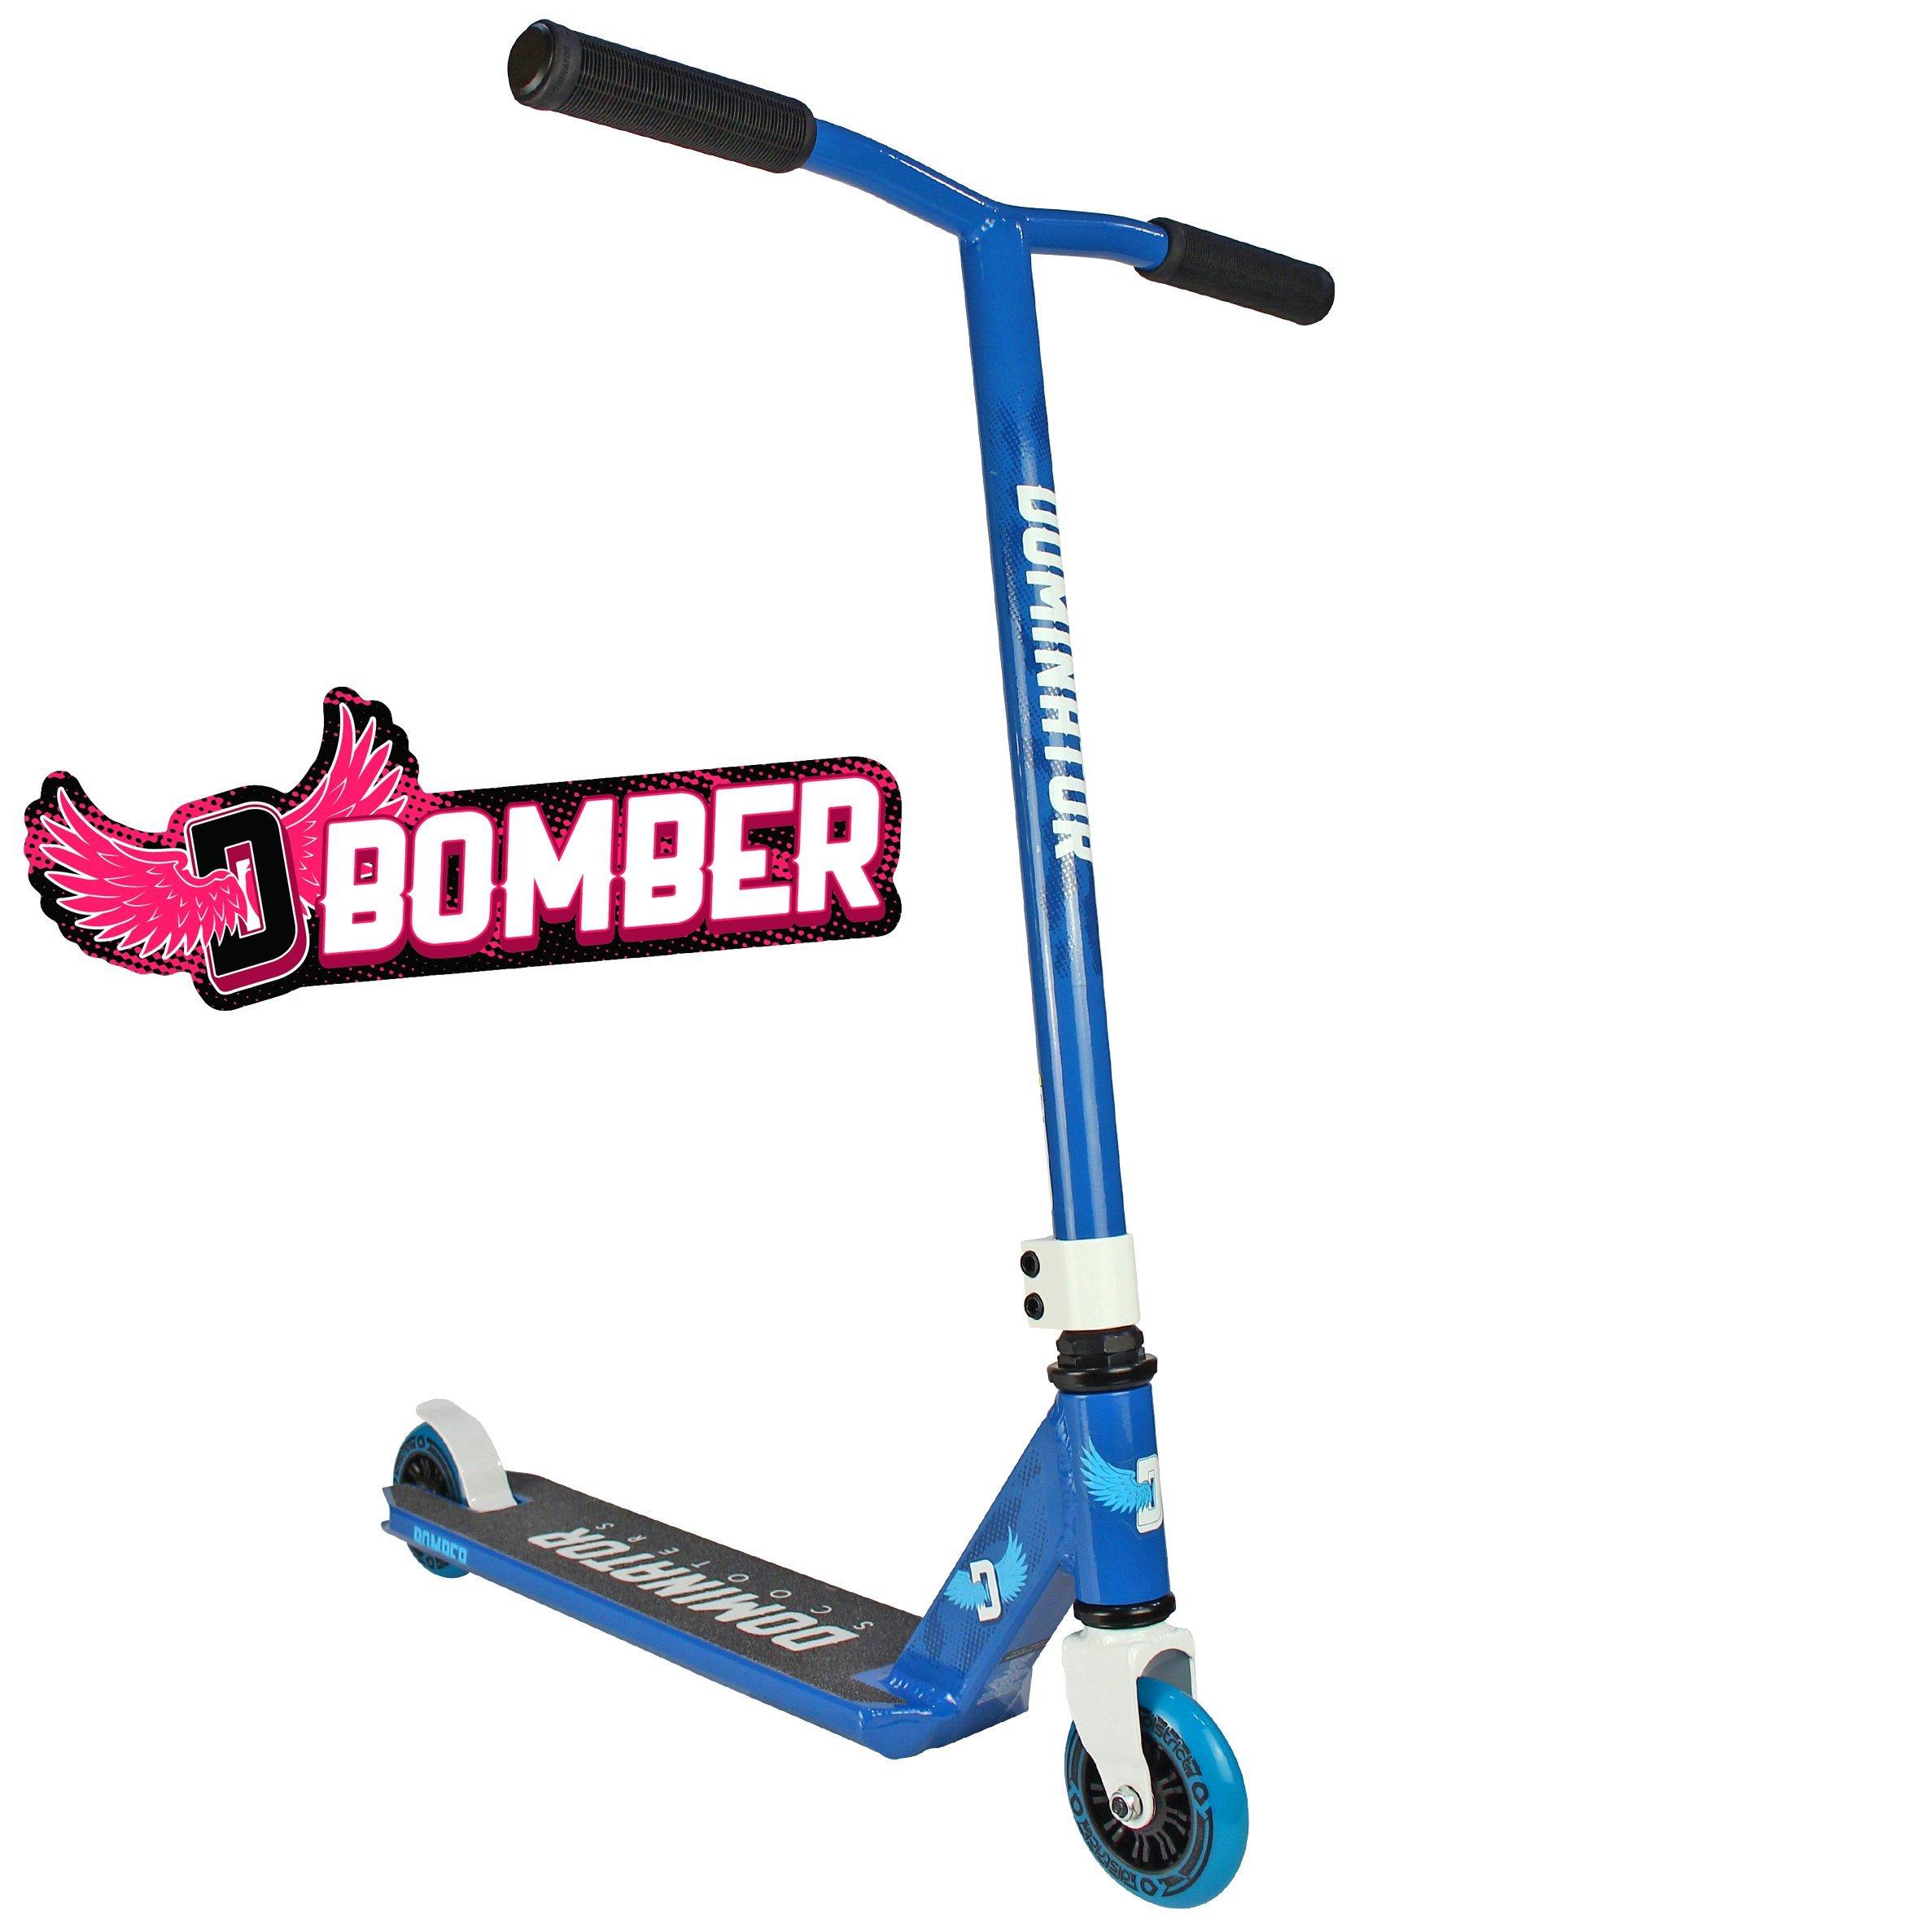 Dominator Bomber Pro Scooter (Blue)